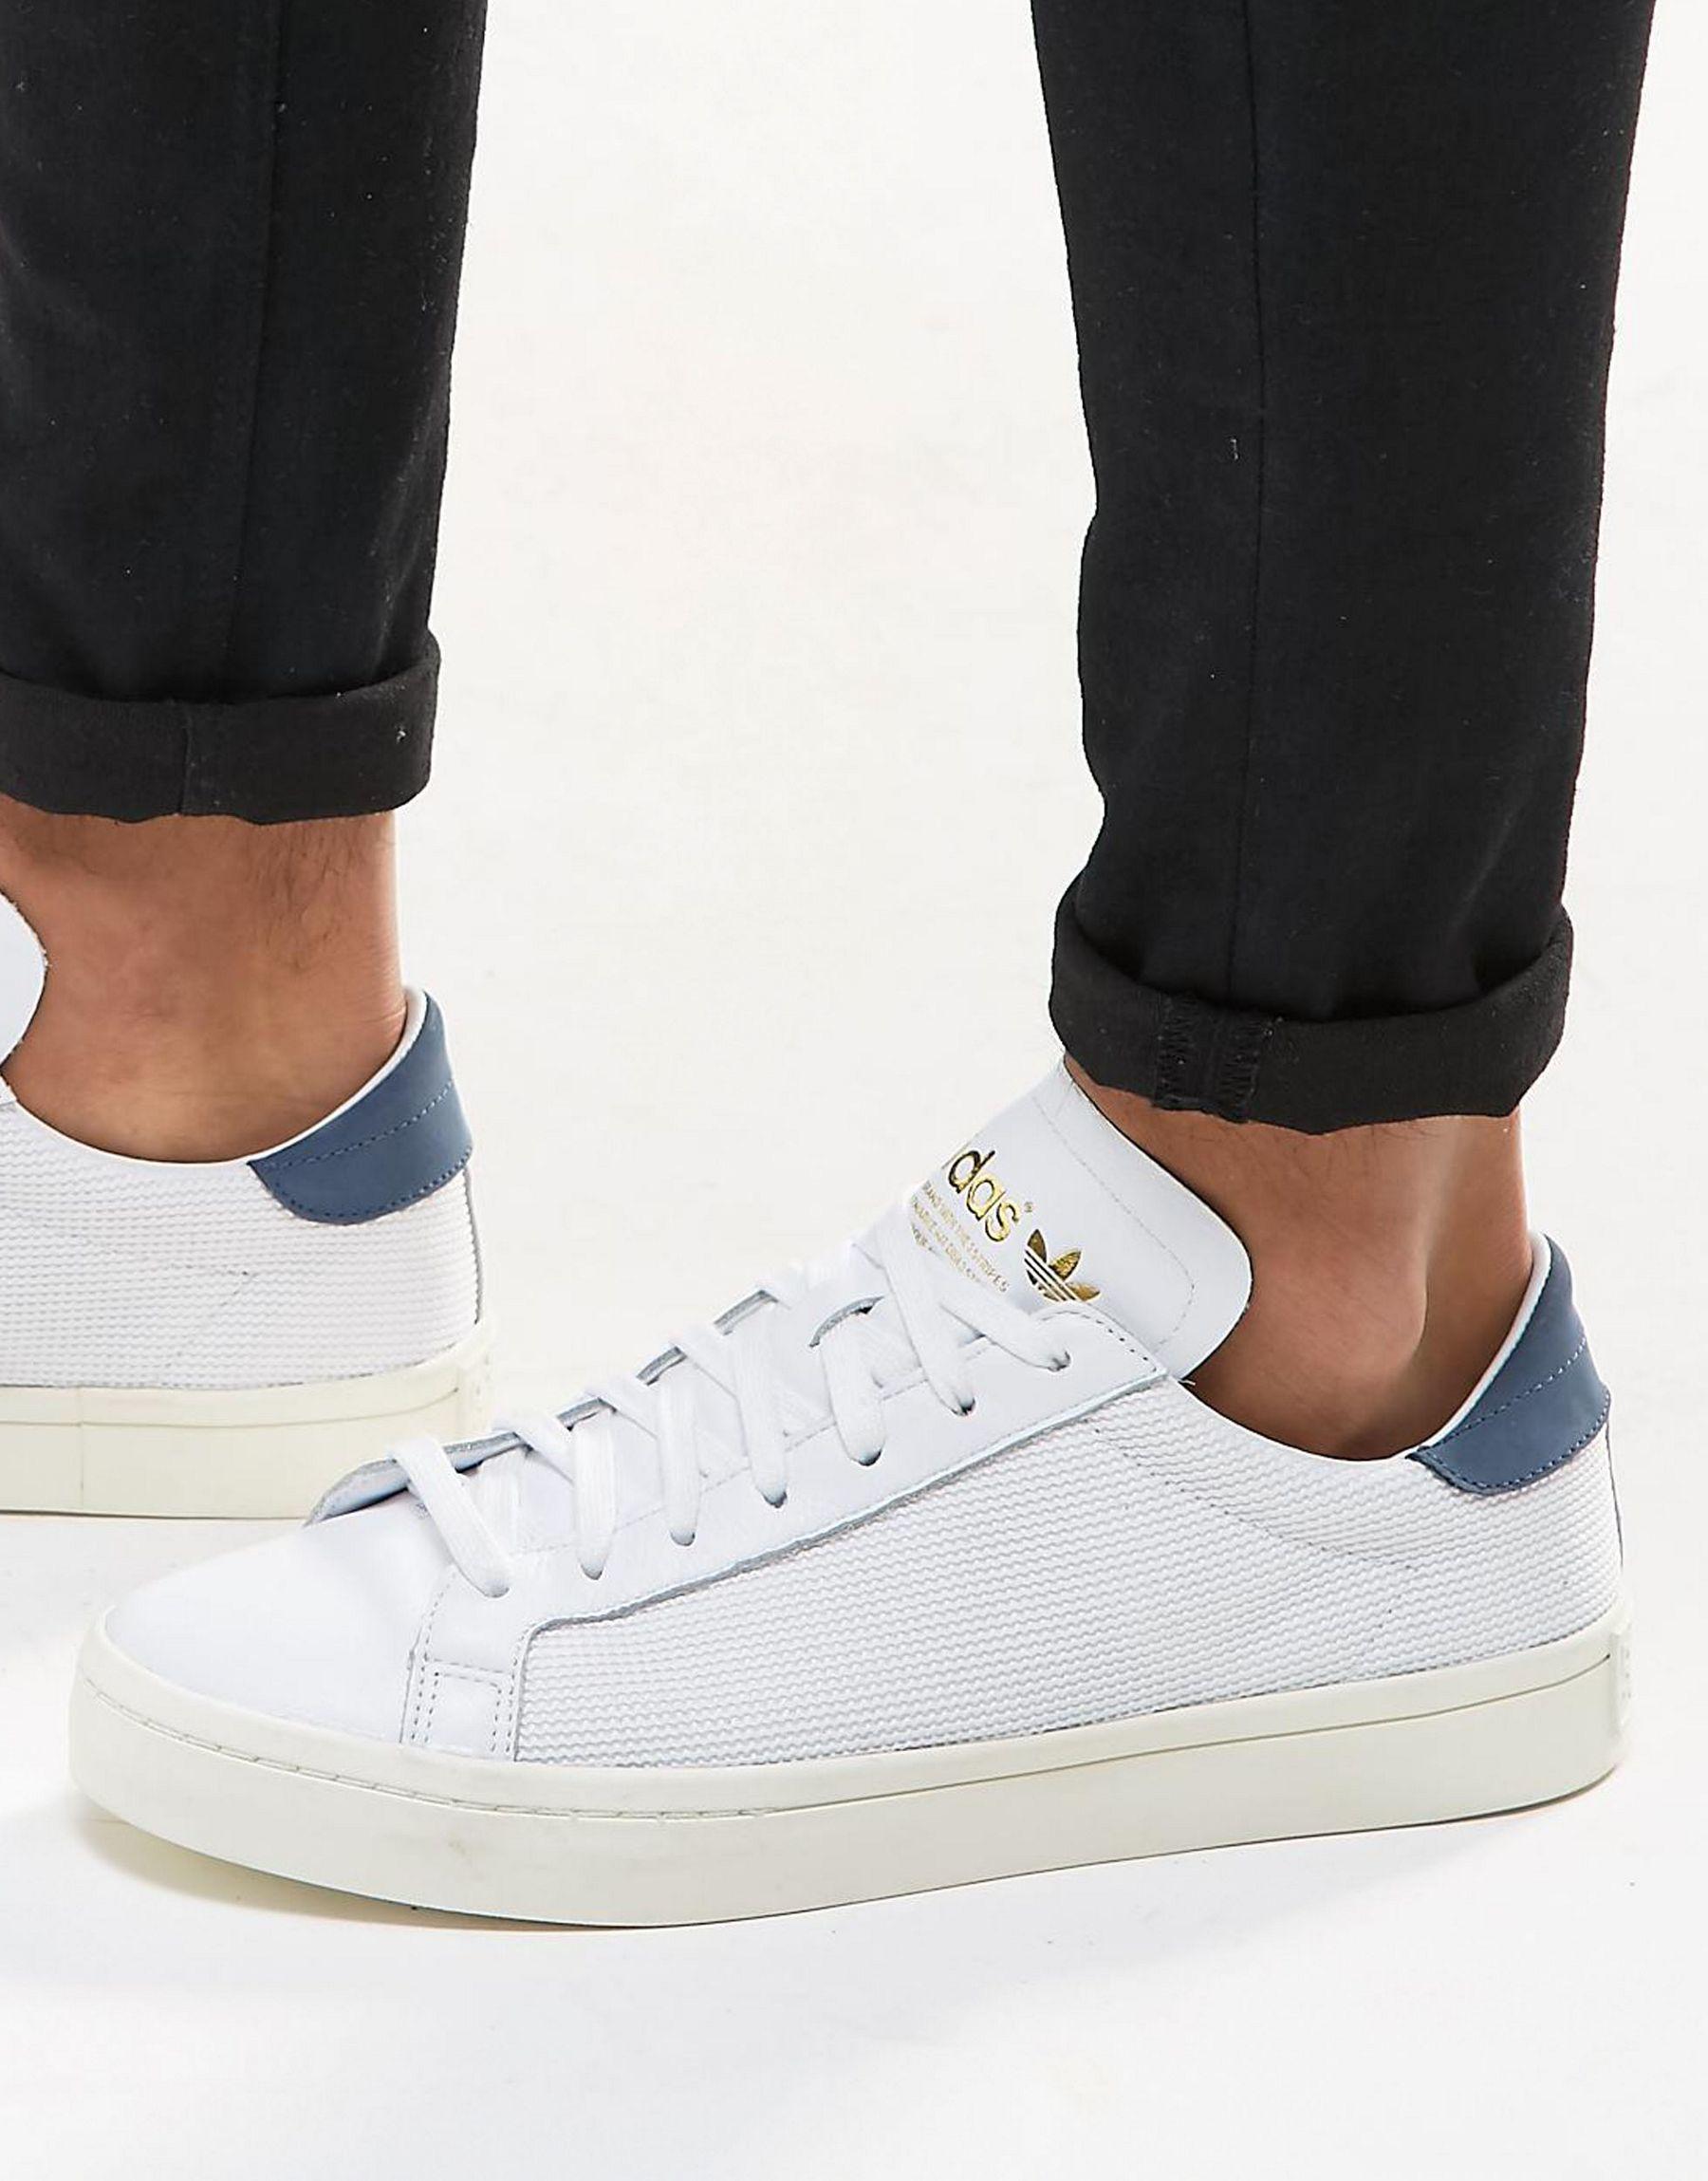 adidas Originals Men Court Vantage Suede Sneakers Fits true